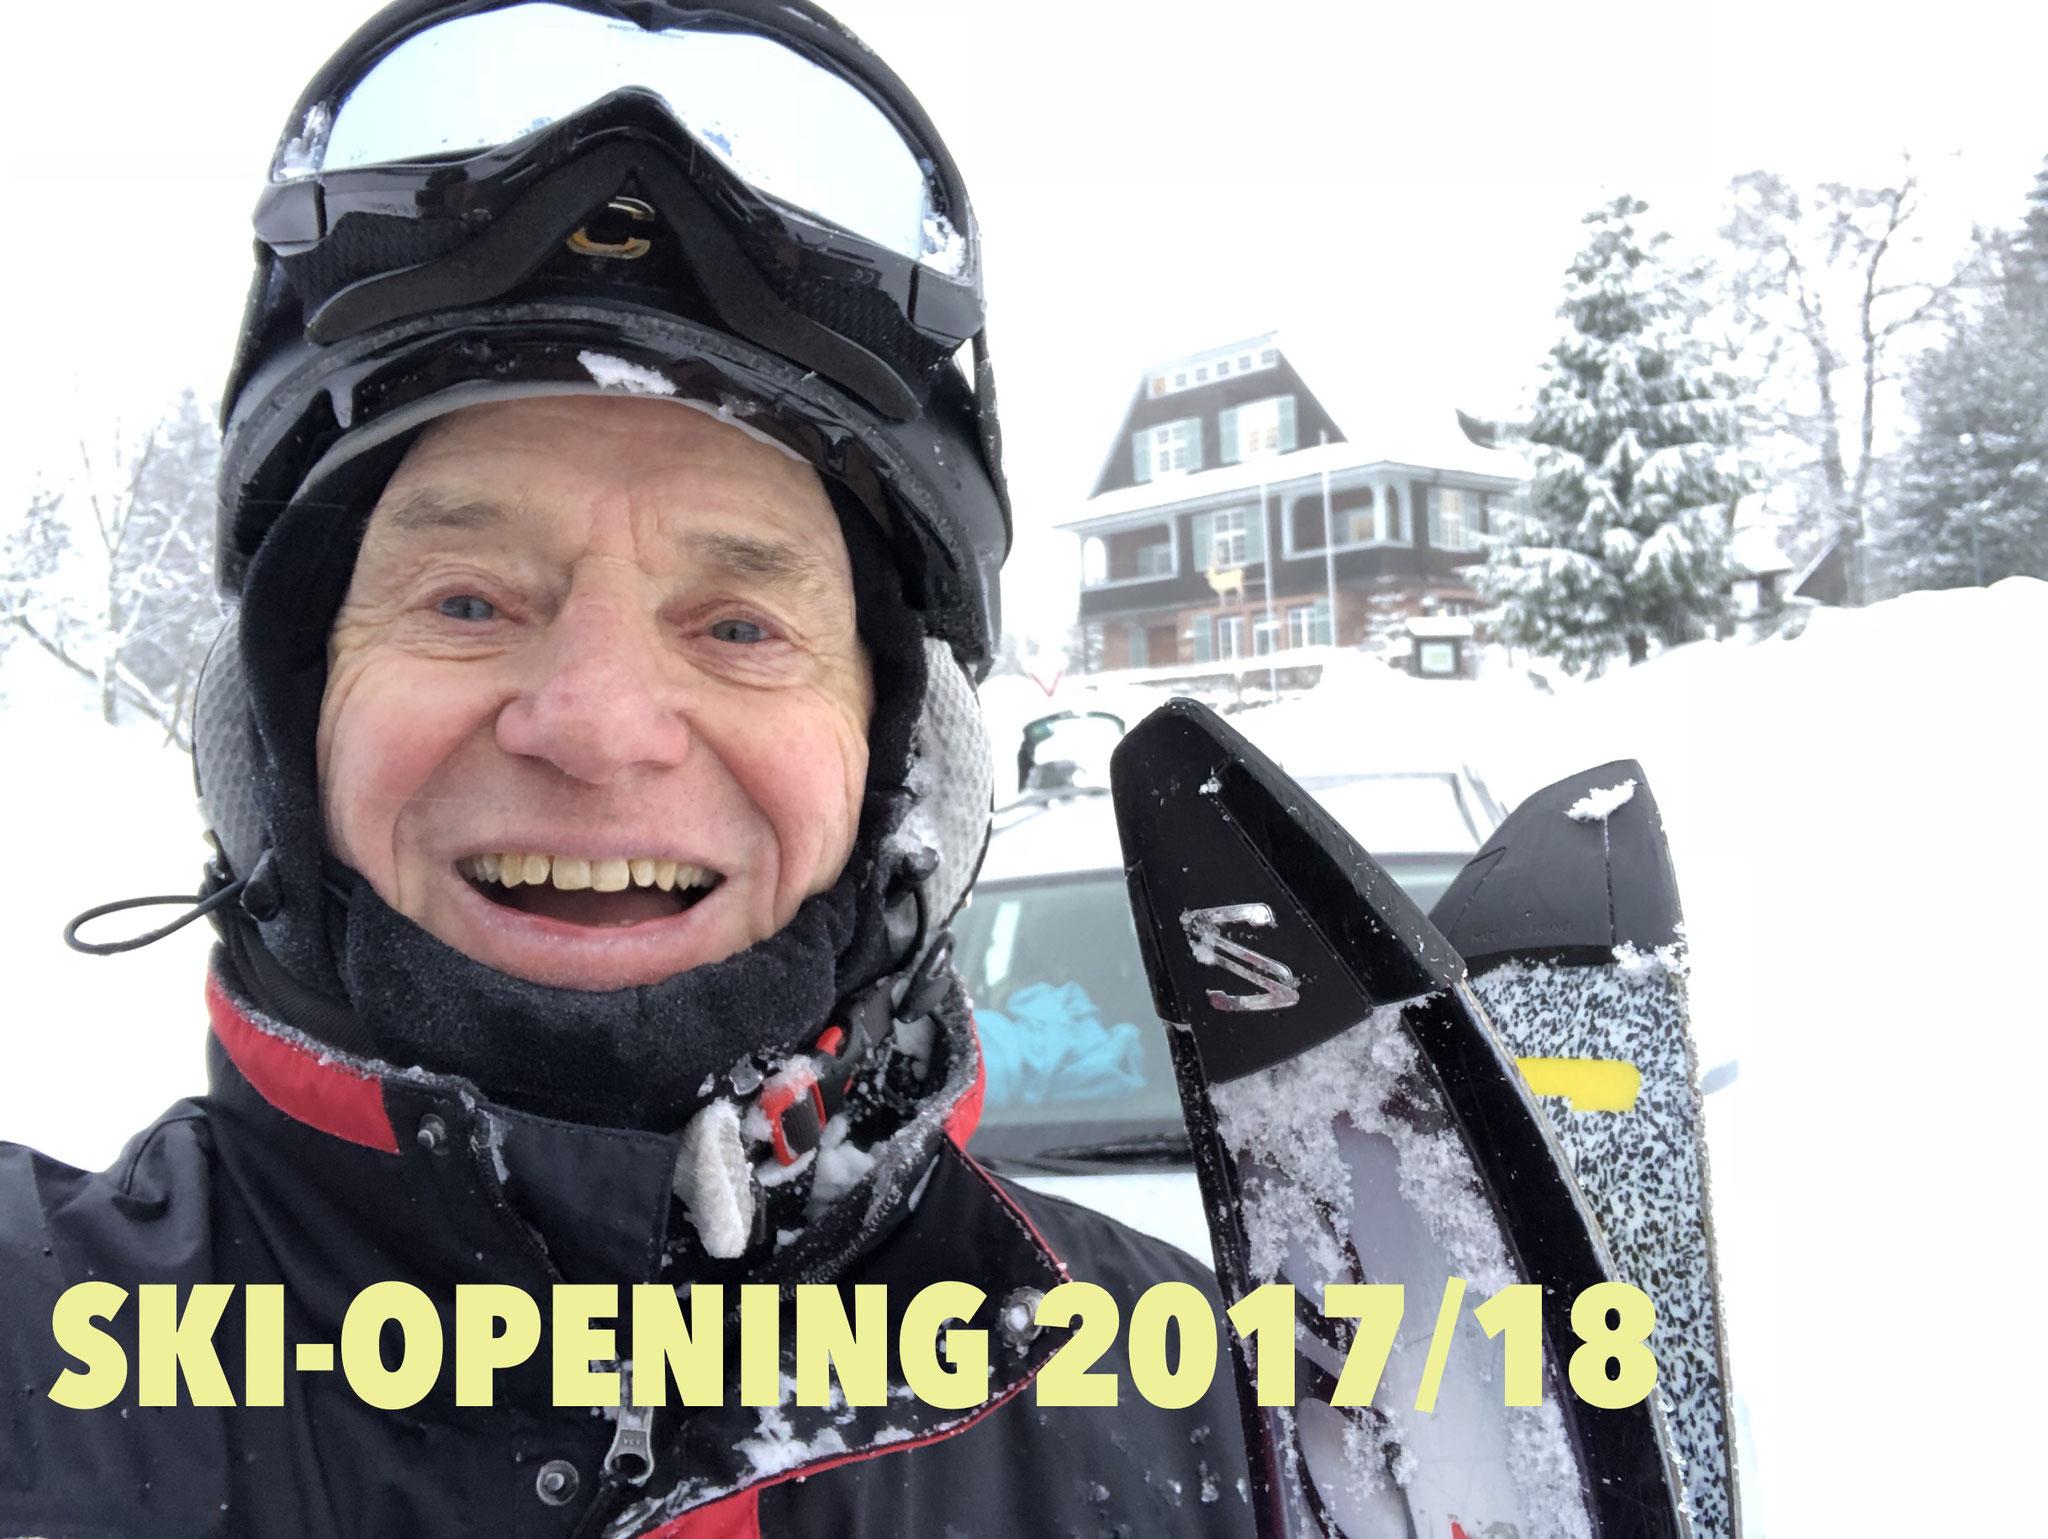 Ruhestein alpin 2017